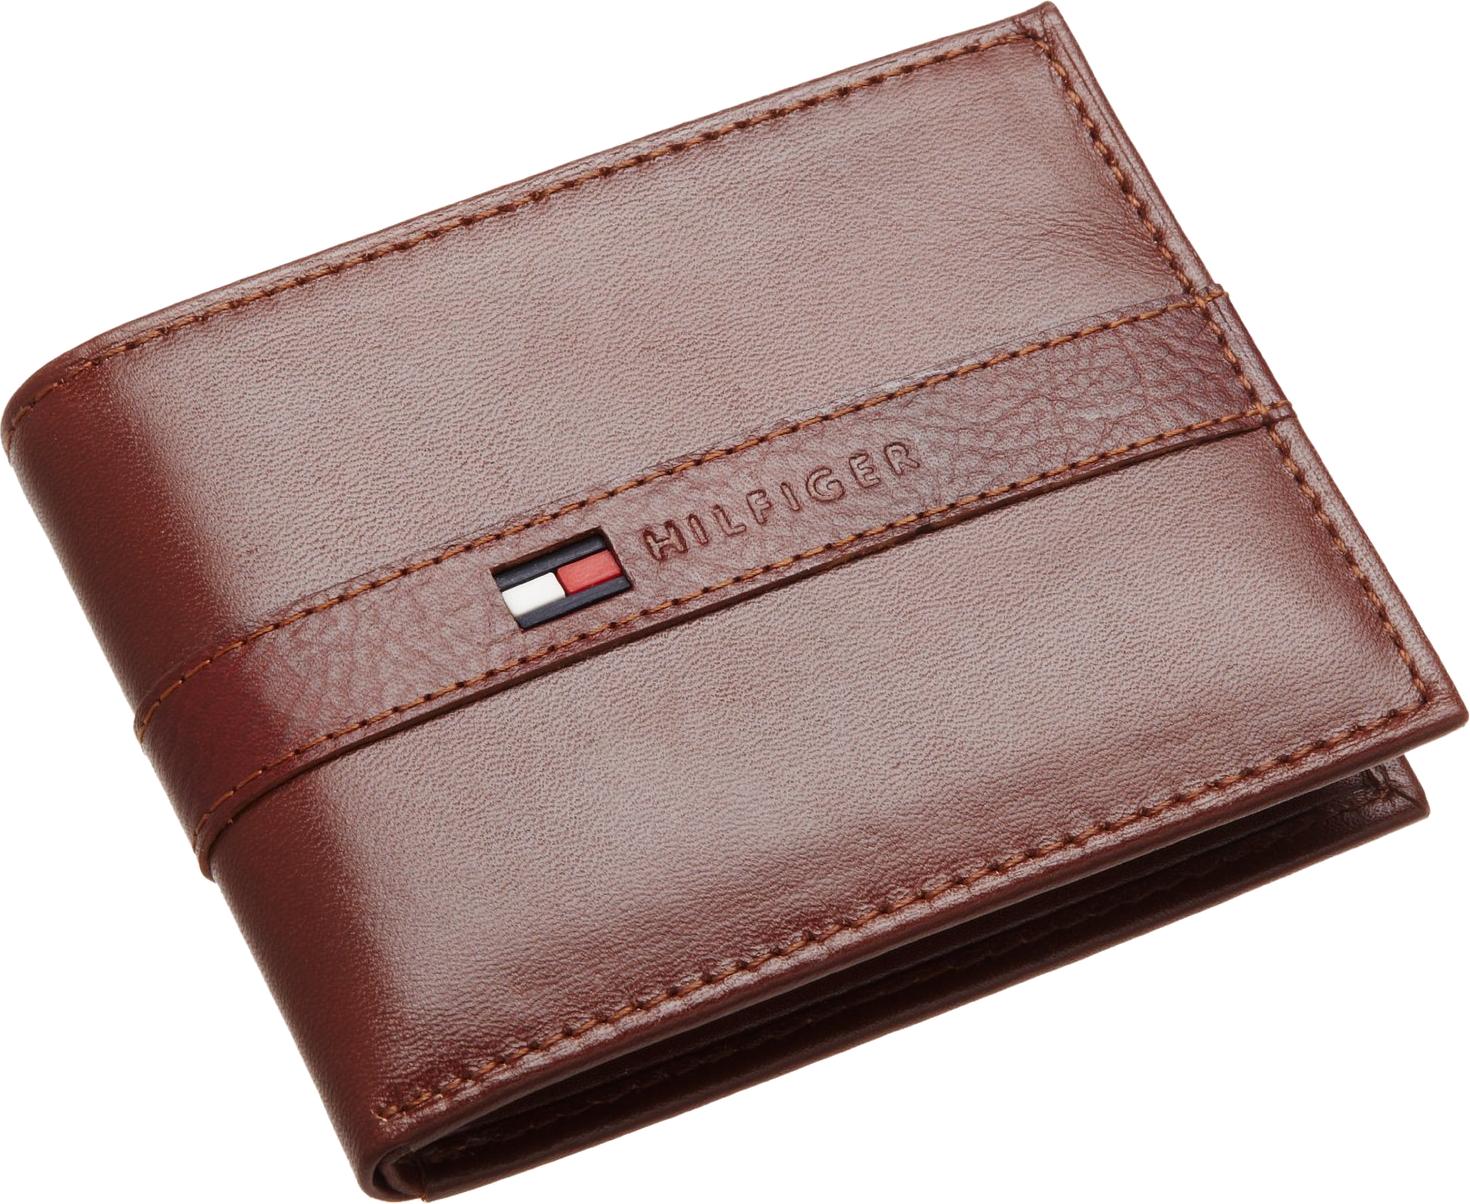 Wallet HD PNG - 96566